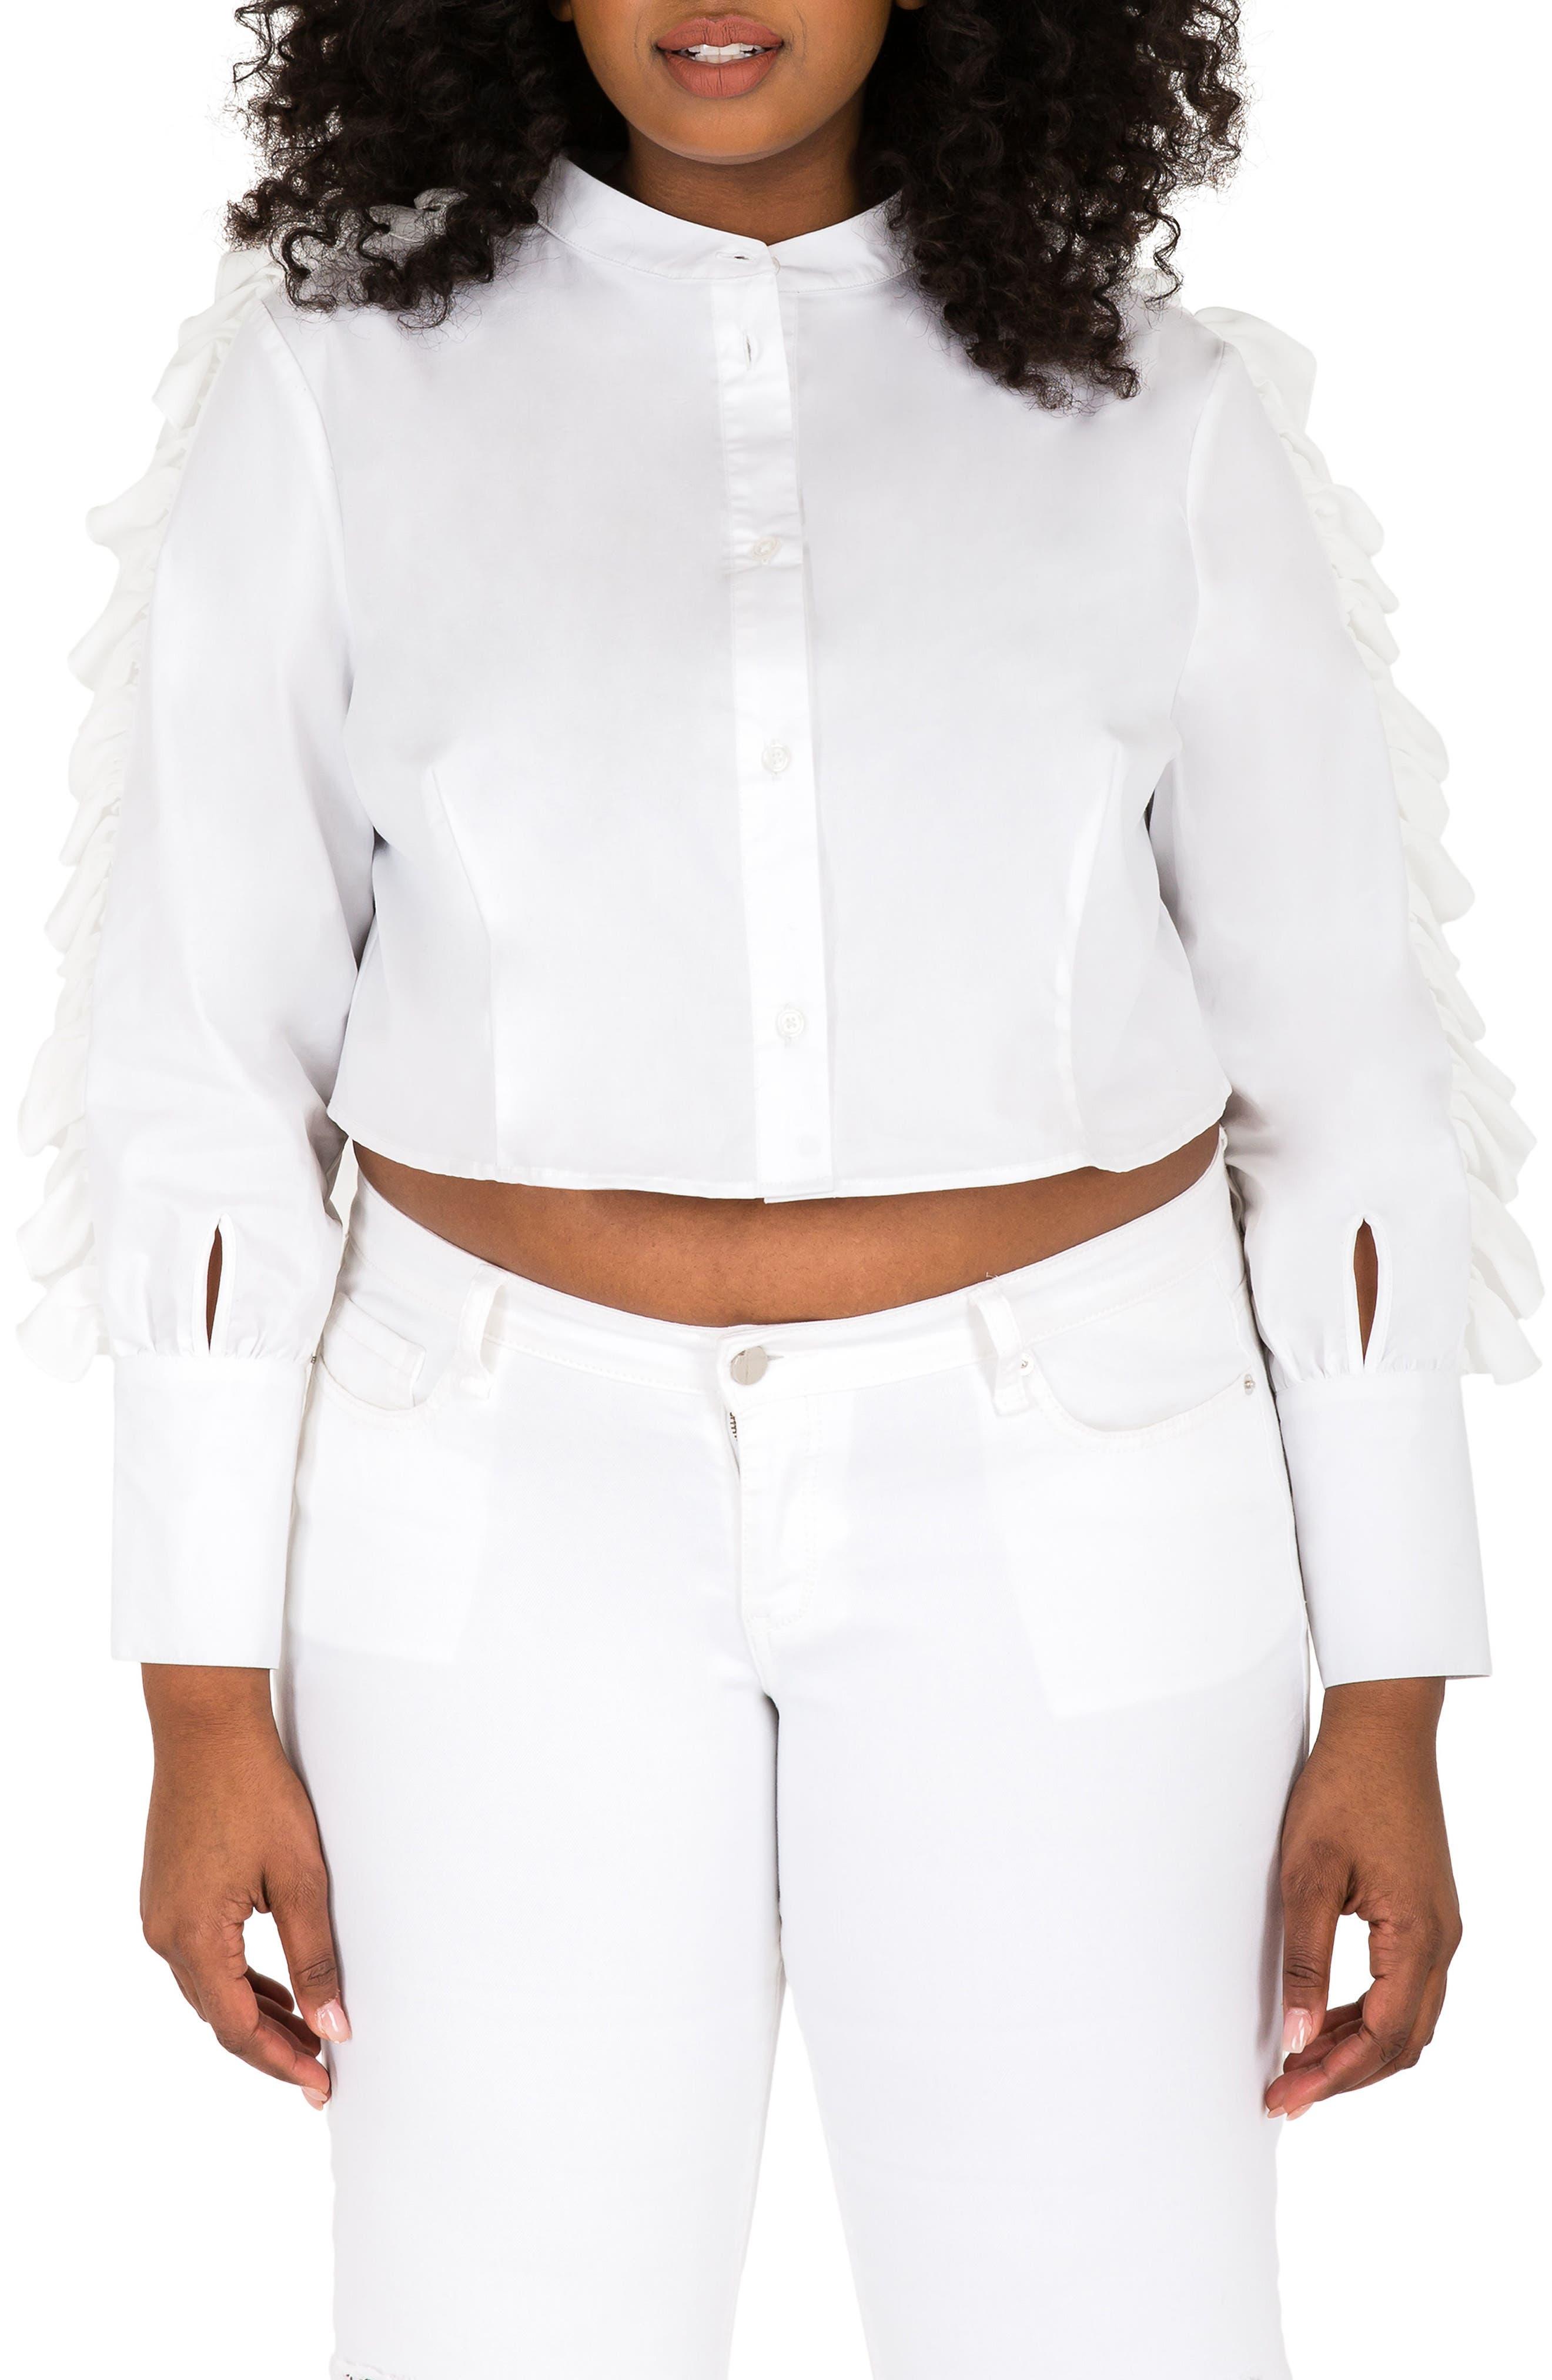 Alternate Image 1 Selected - Poetic Justice Mayasia Ruffle Sleeve Crop Shirt (Plus Size)